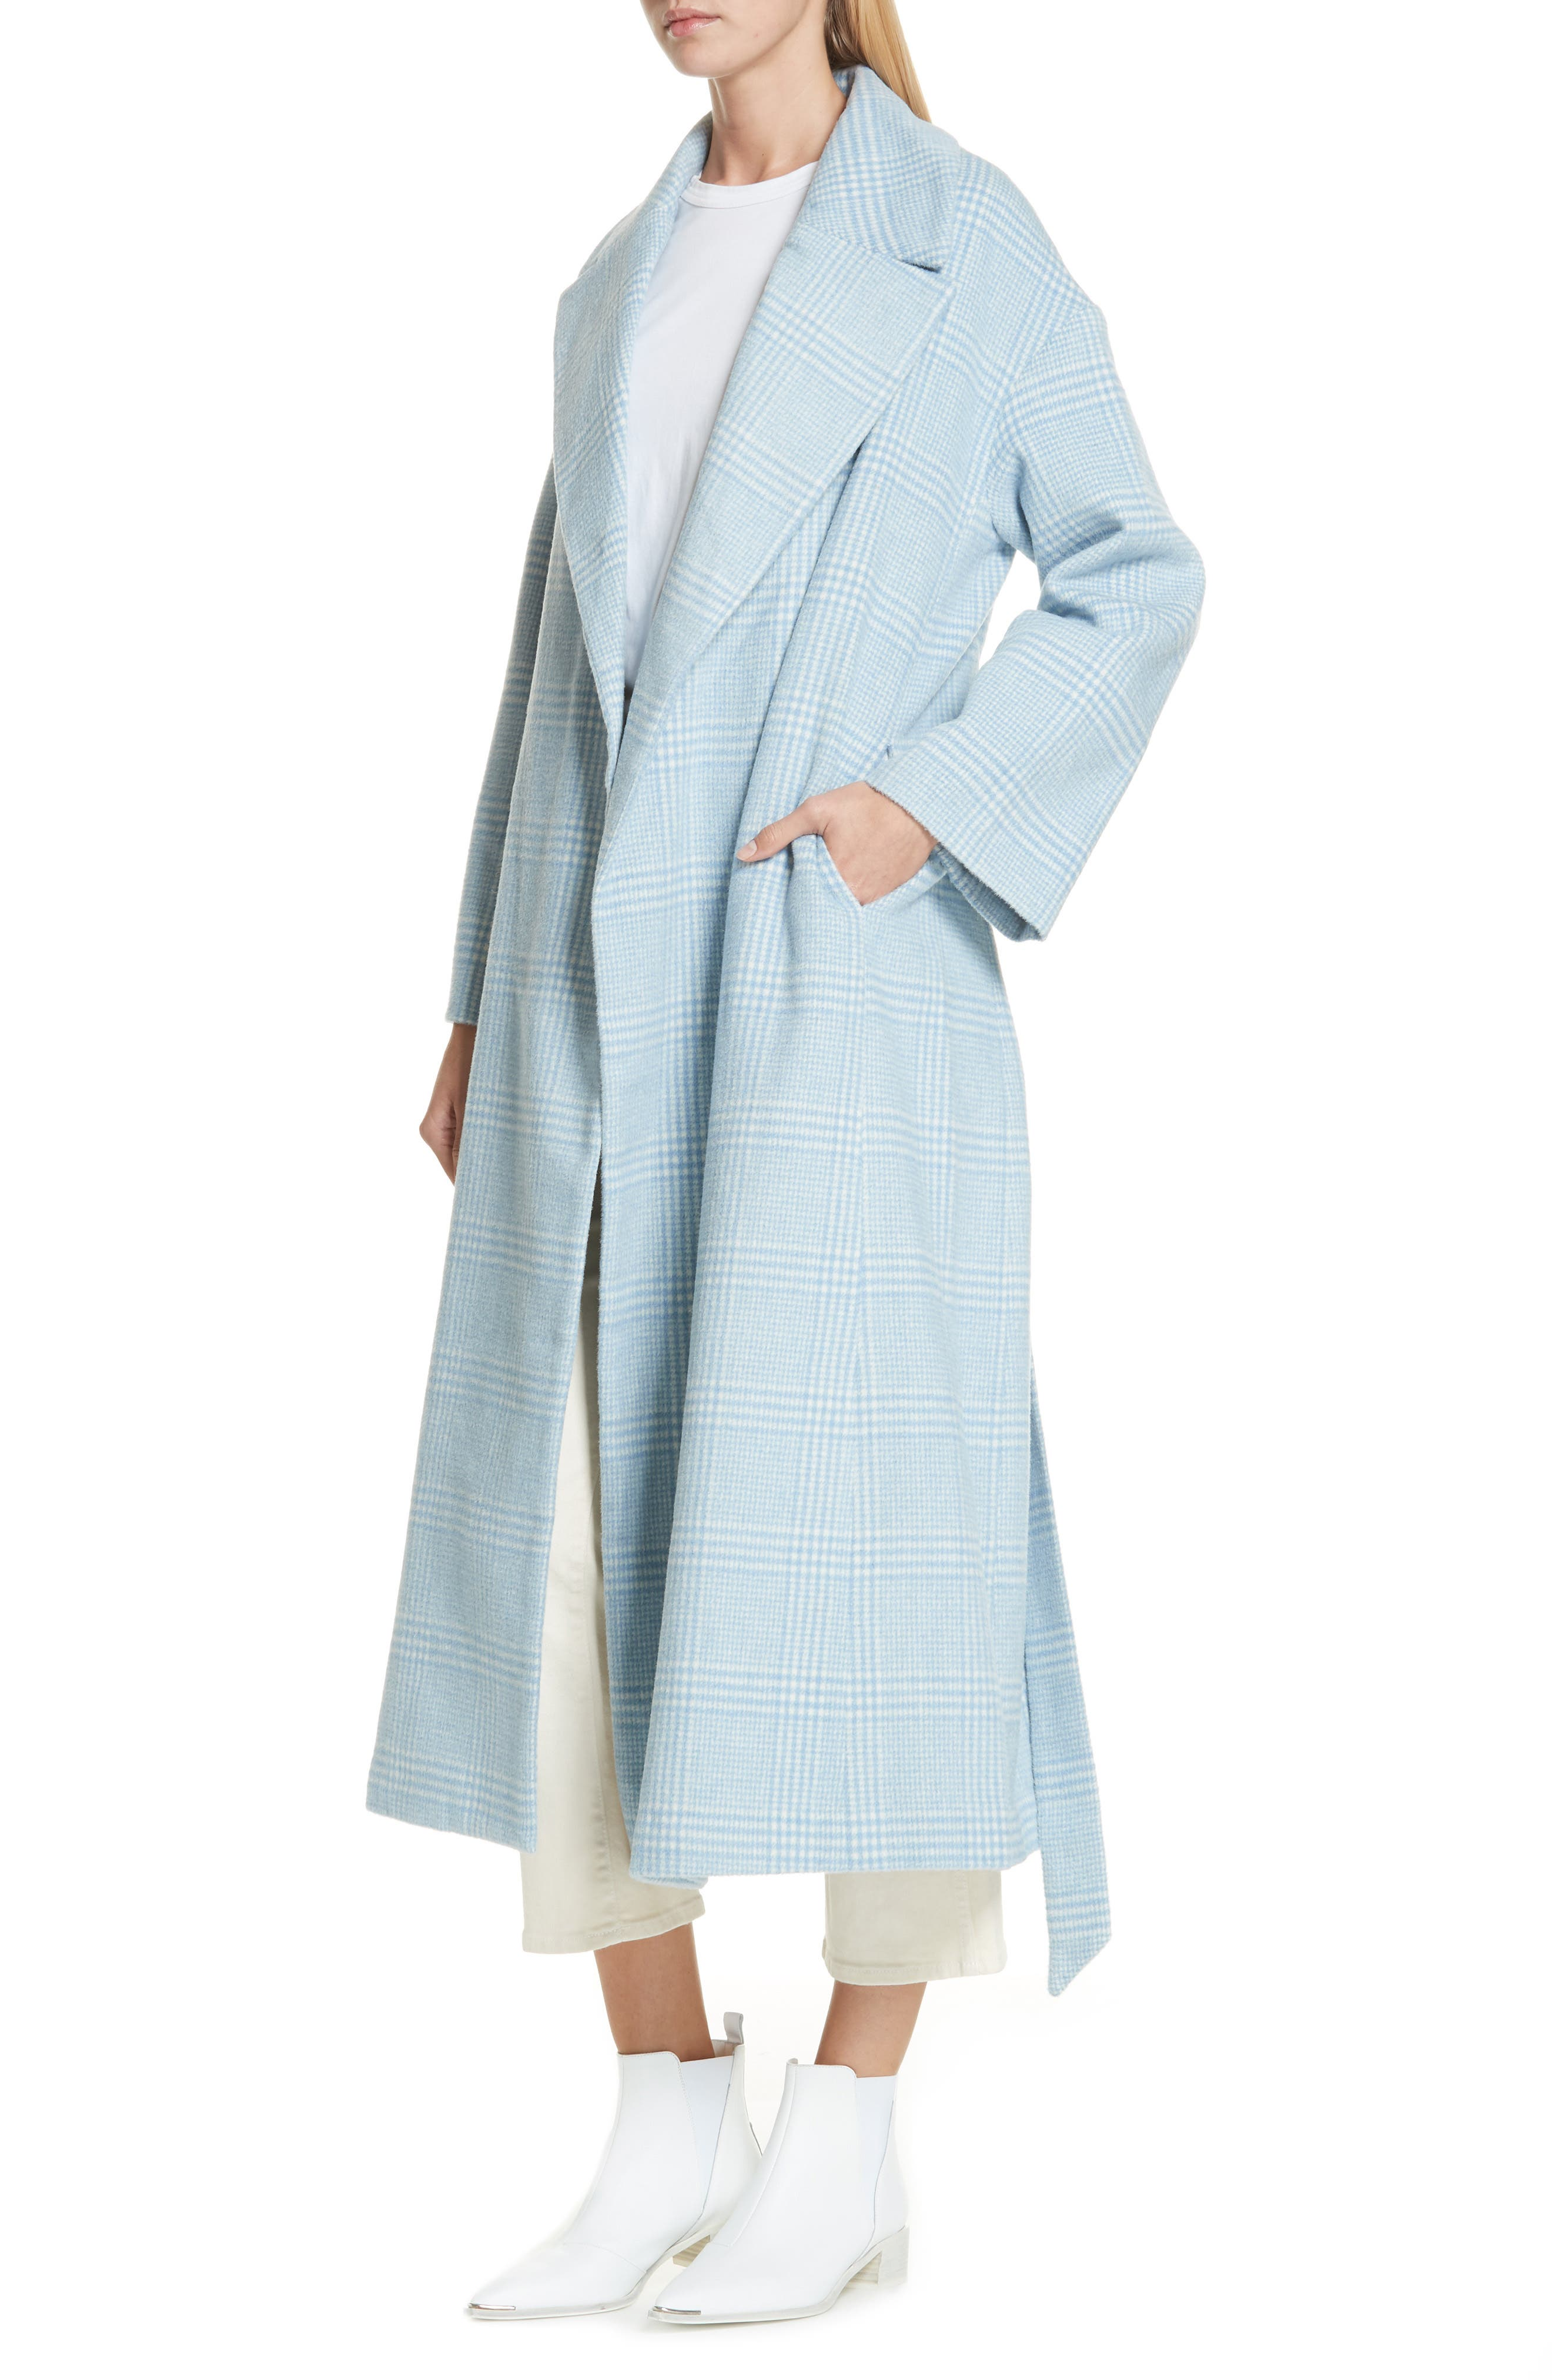 Woodside Coat,                             Alternate thumbnail 4, color,                             SERENITY BLUE